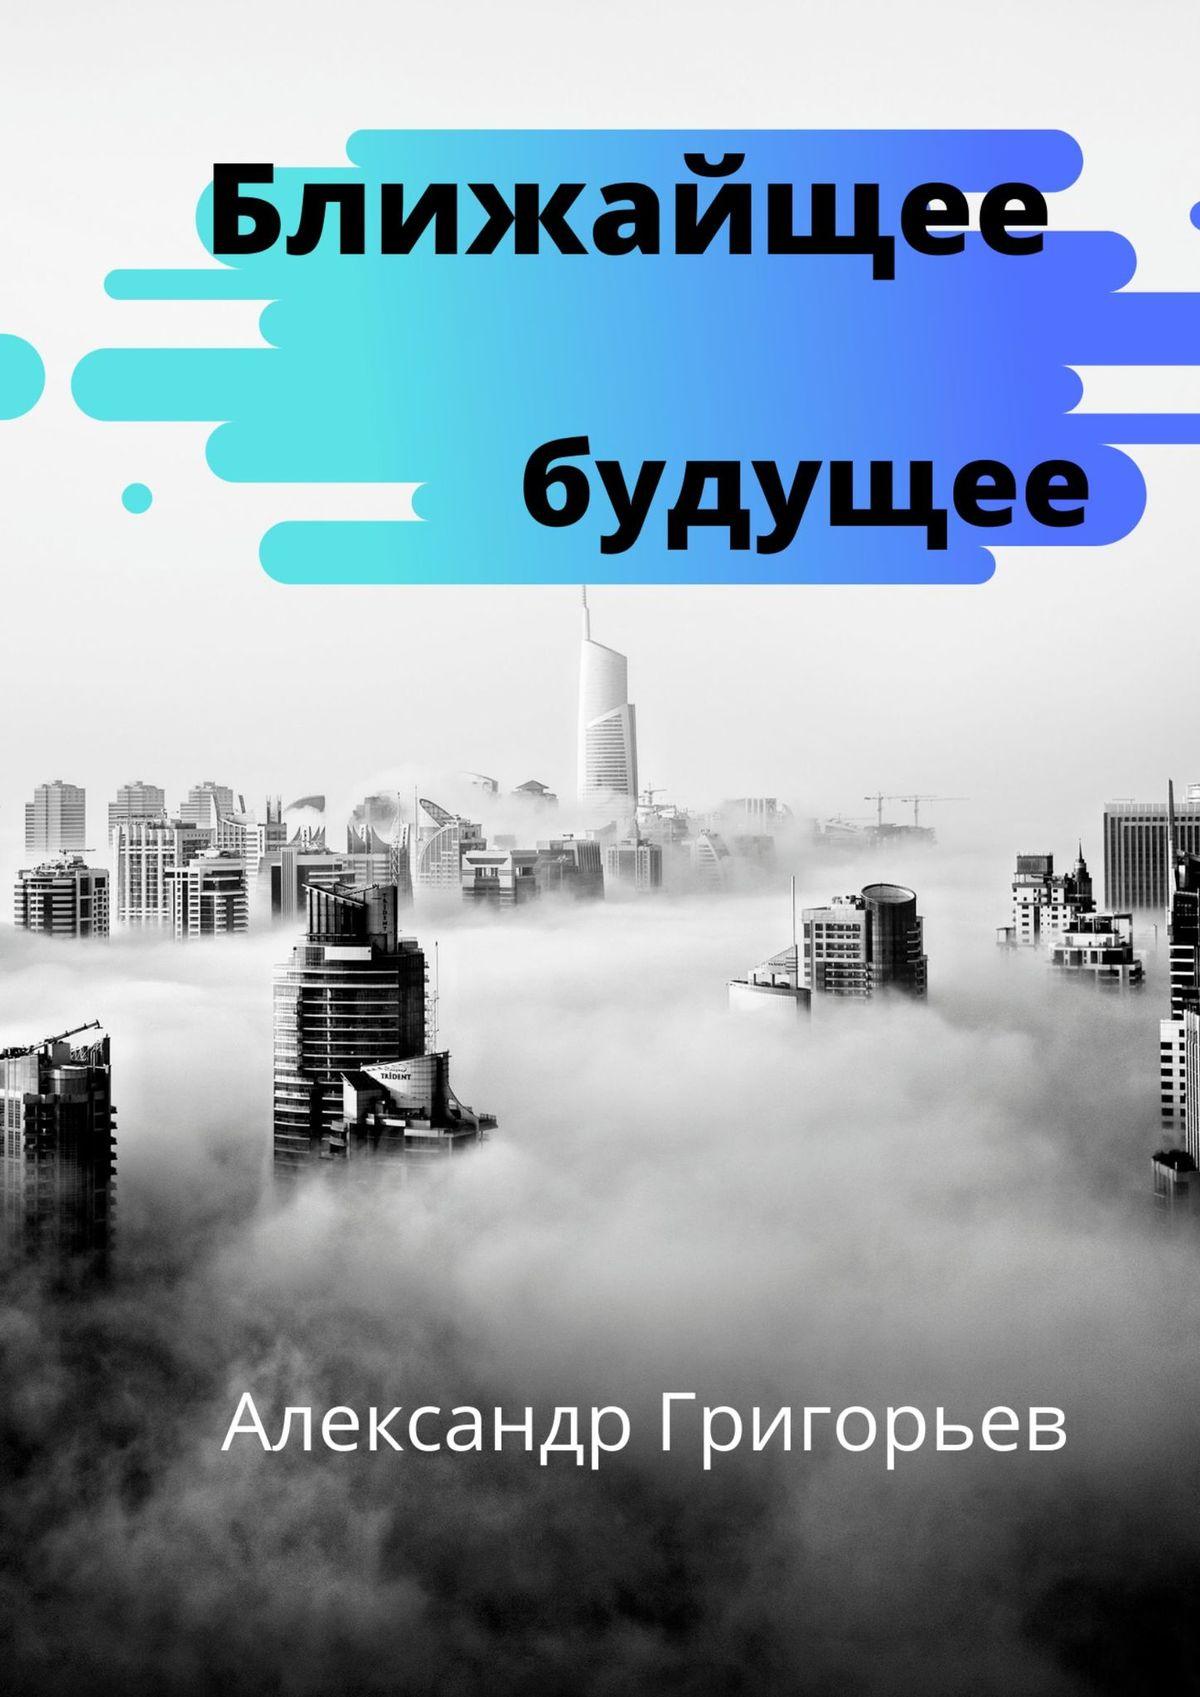 Александр Владимирович Григорьев Ближайшее будущее александр владимирович григорьев ближайшее будущее